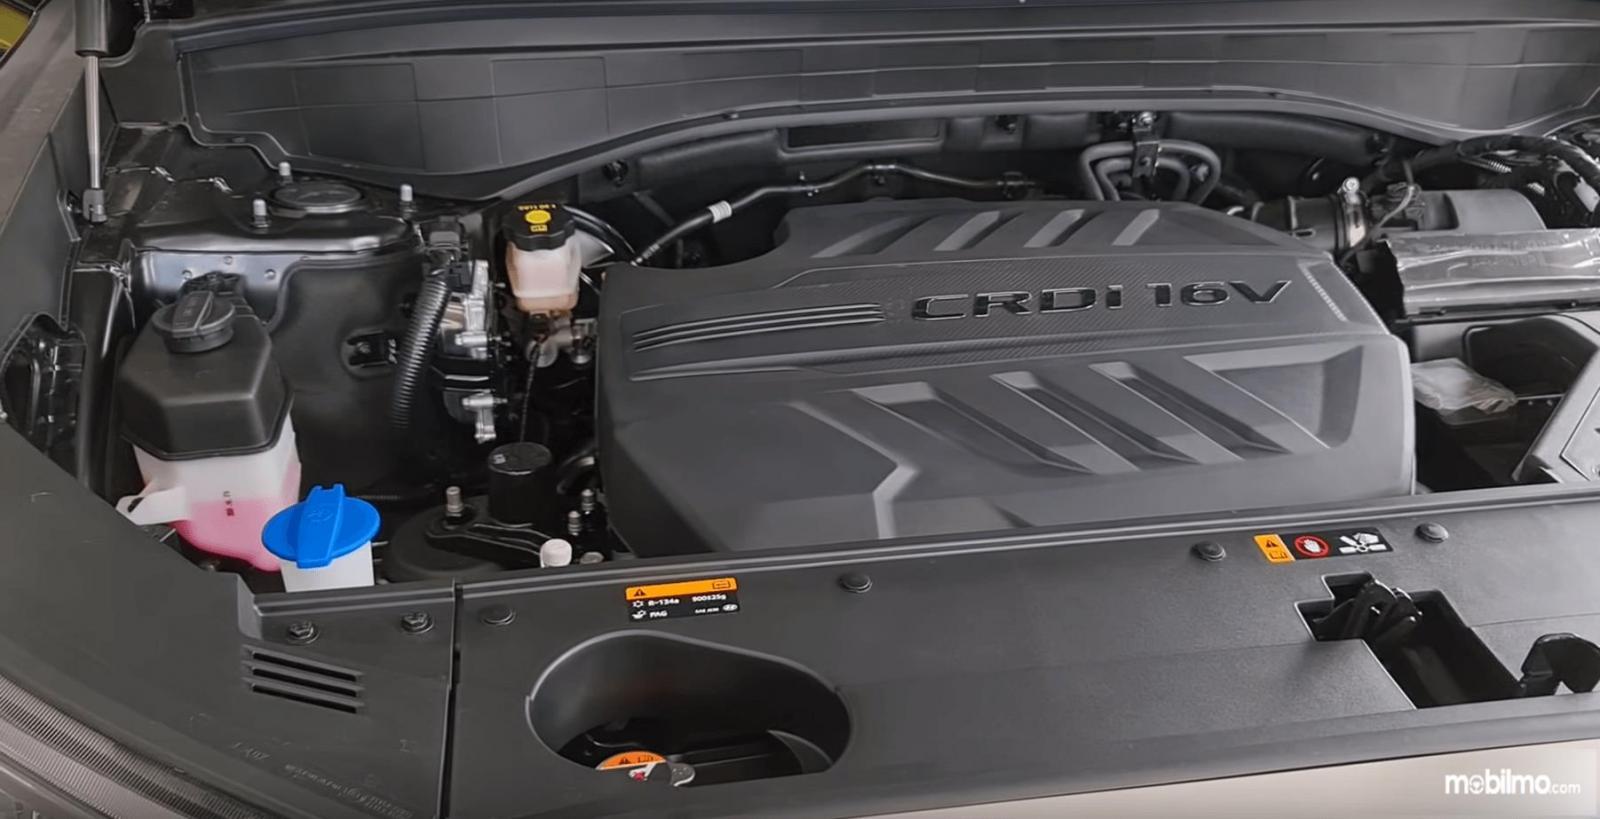 Gambar ini menunjukkan mesin mobil Hyundai Palisade Signature 2020